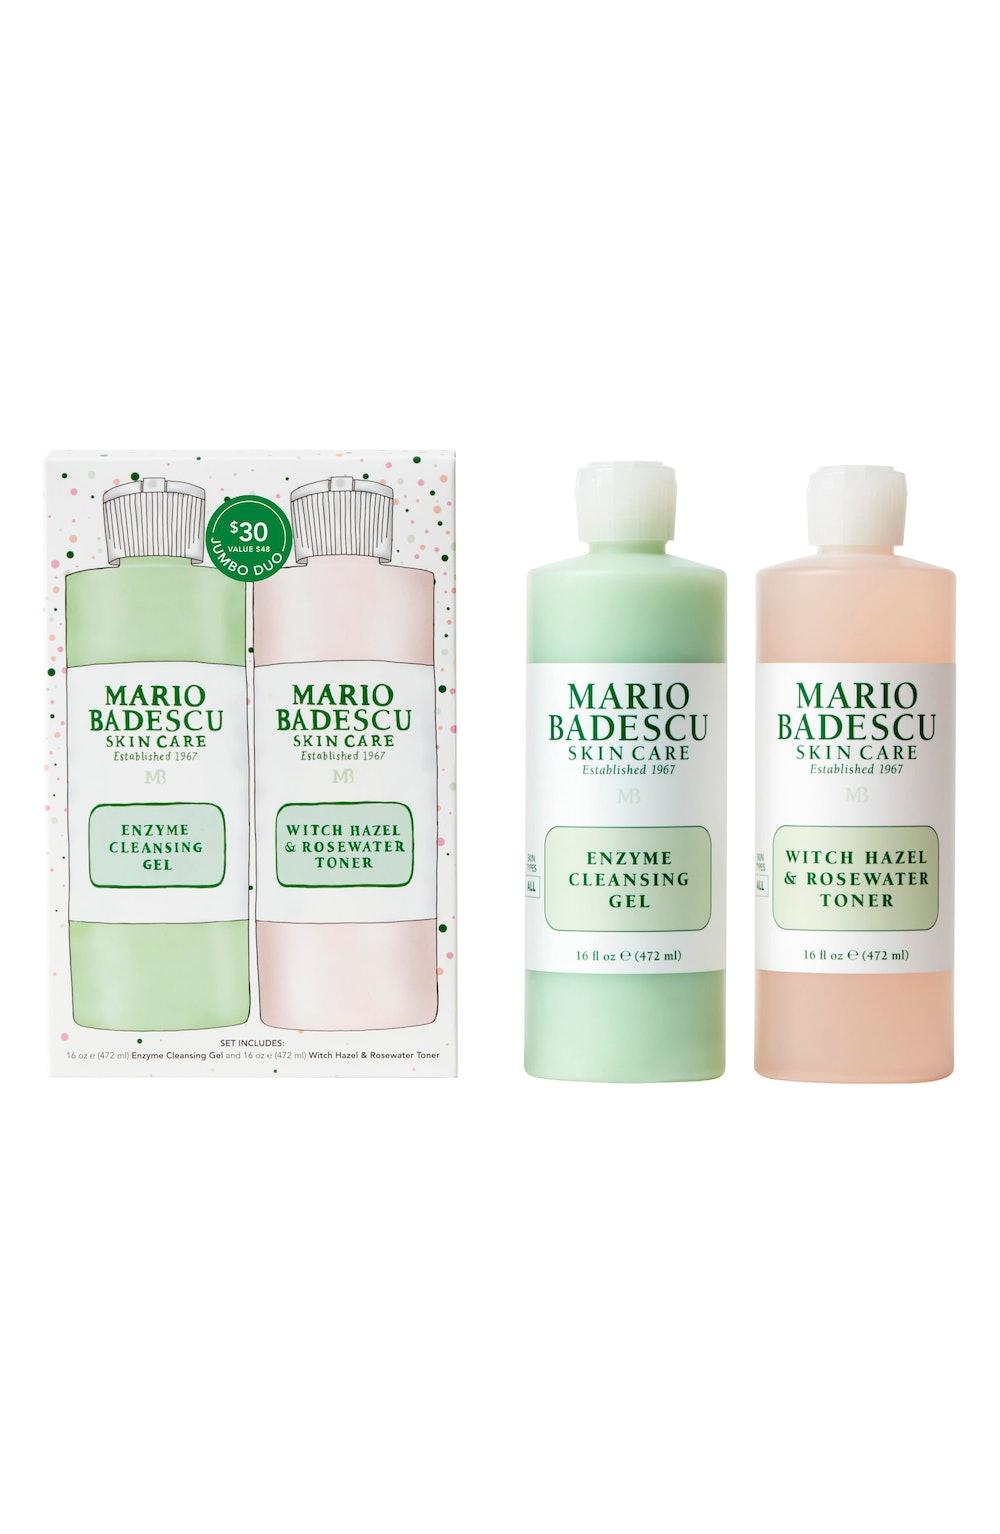 Mario Badescu Jumbo Size Enzyme Cleansing Gel & Witch Hazel & Rosewater Toner